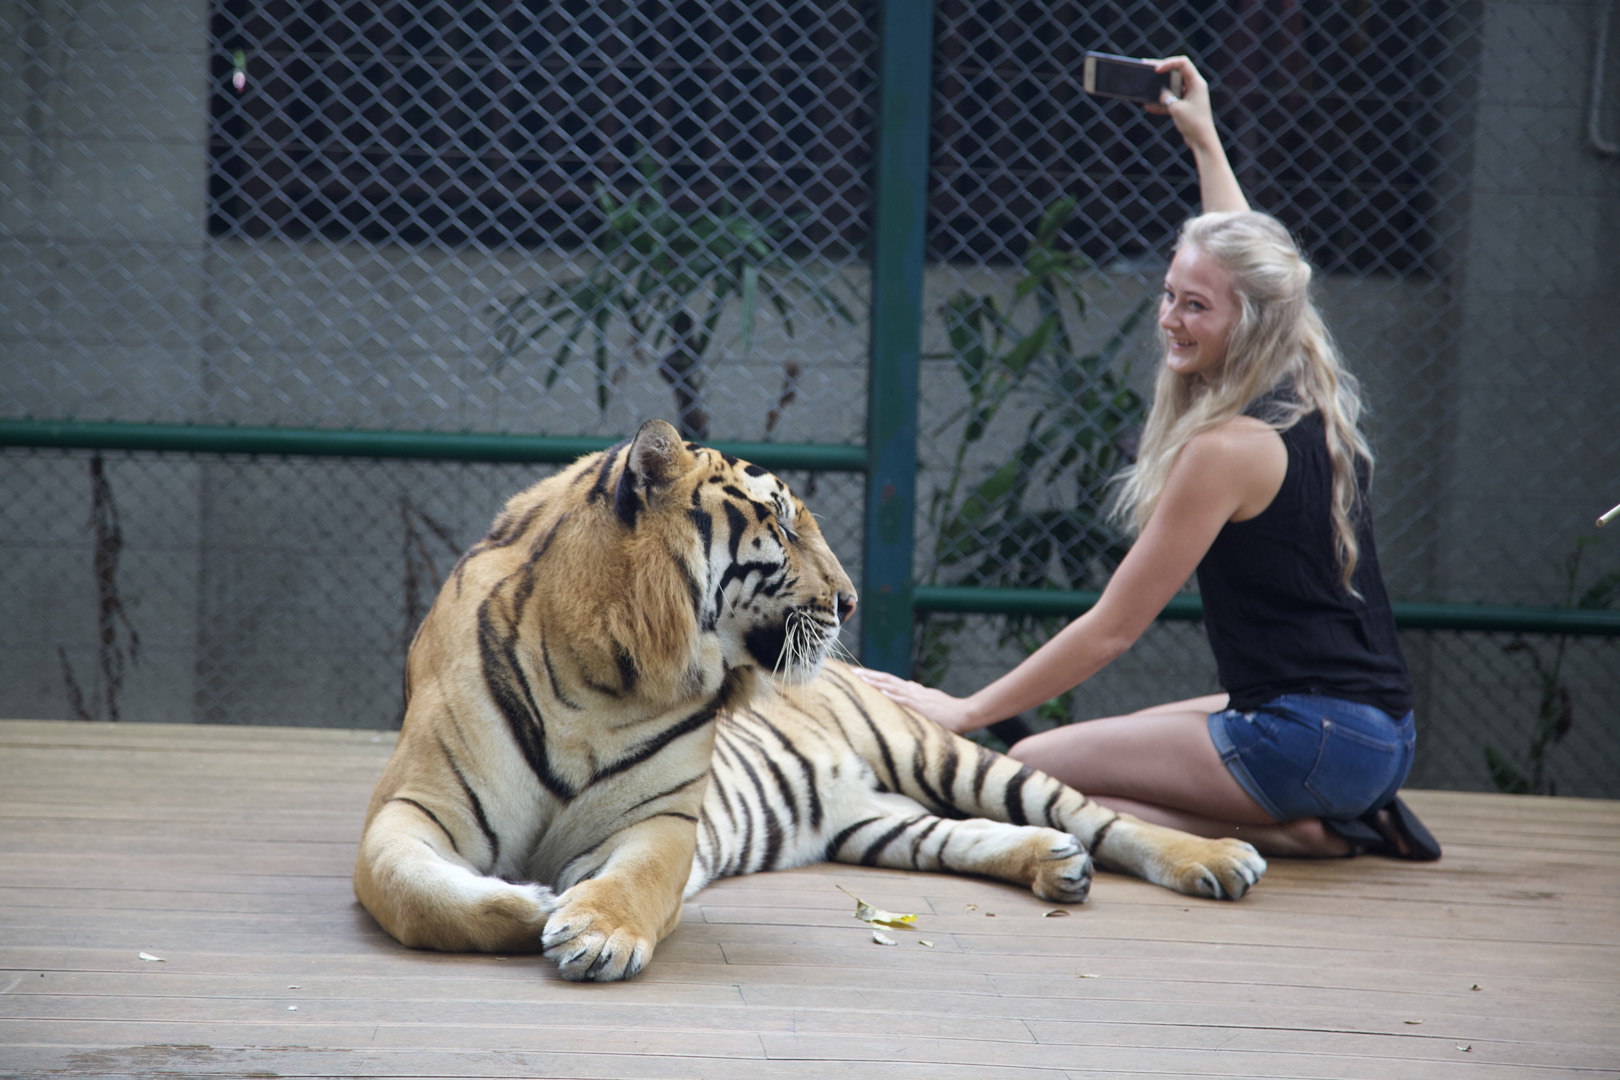 Russian tourist takes a selfie, Tiger Kingdom